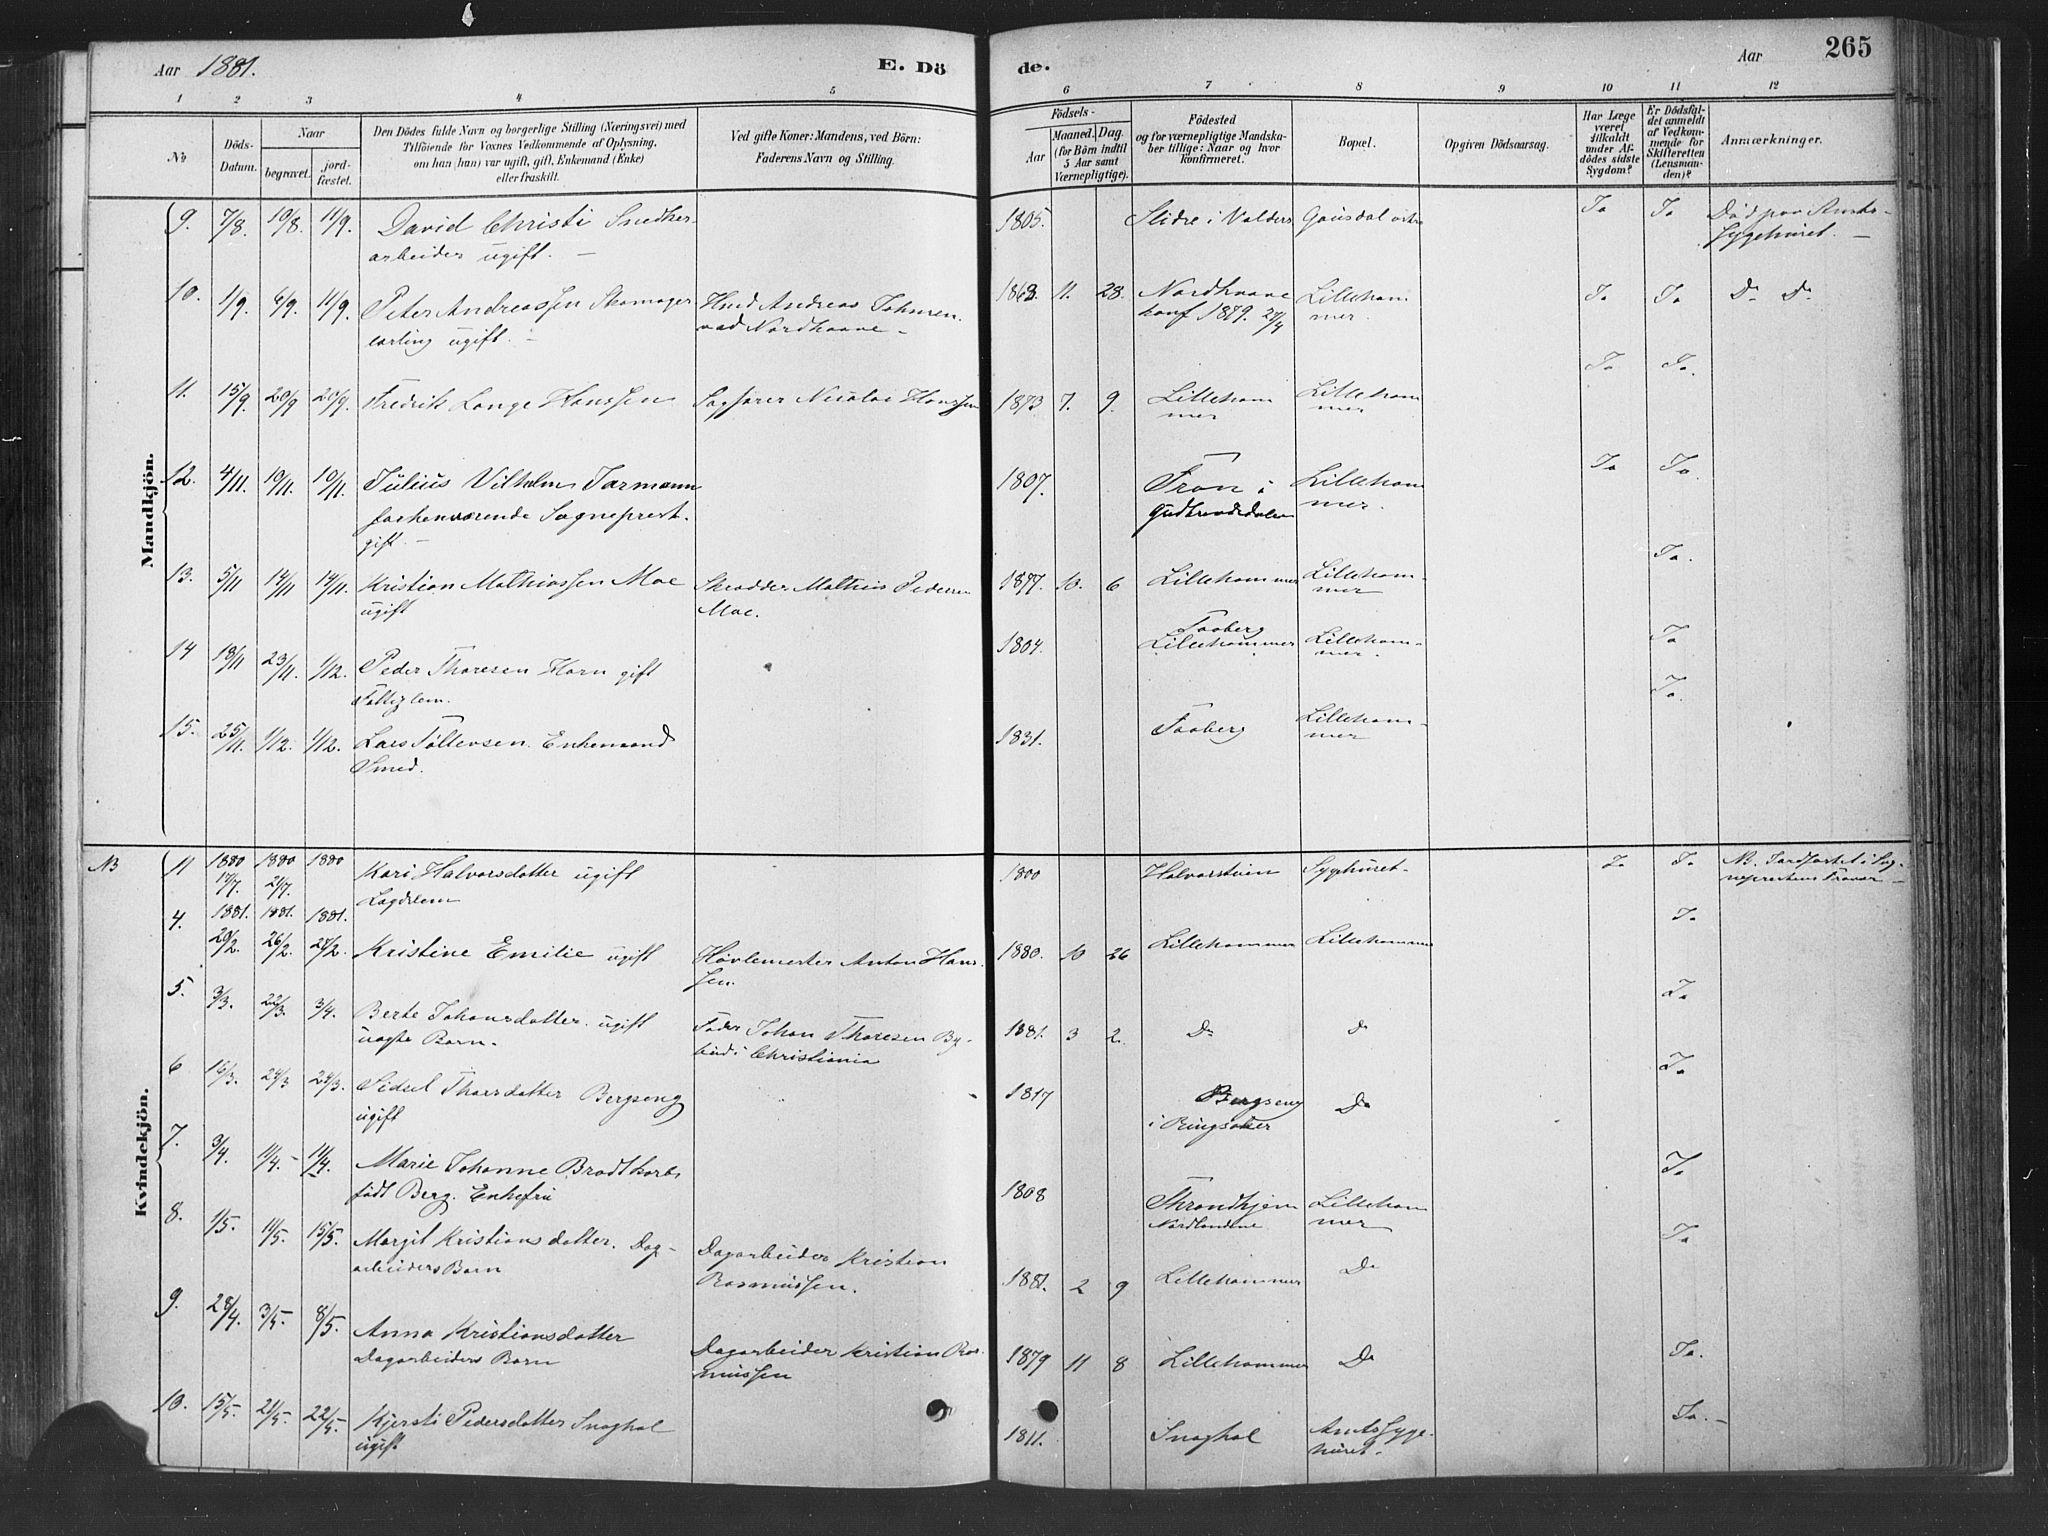 SAH, Fåberg prestekontor, H/Ha/Haa/L0010: Ministerialbok nr. 10, 1879-1900, s. 265